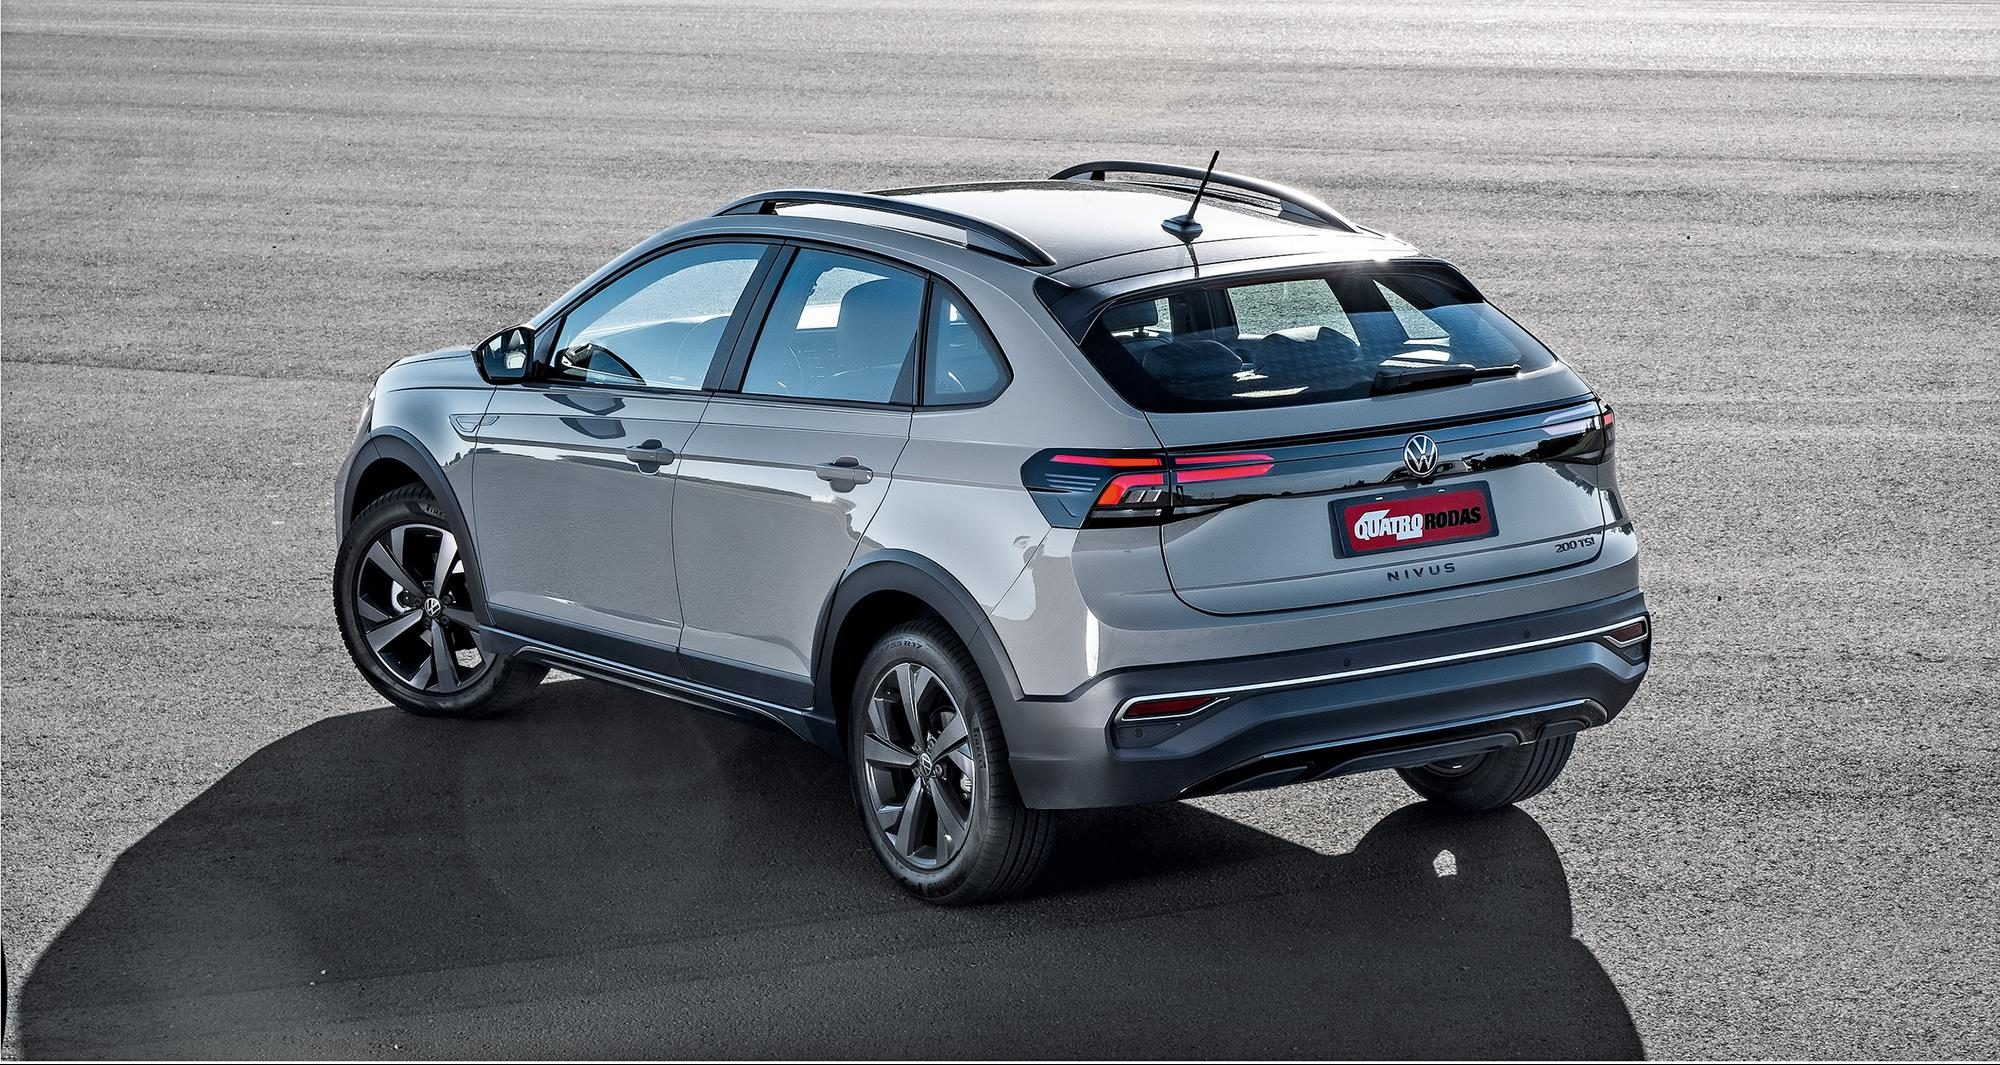 Traseira do Volkswagen Nivus cinza